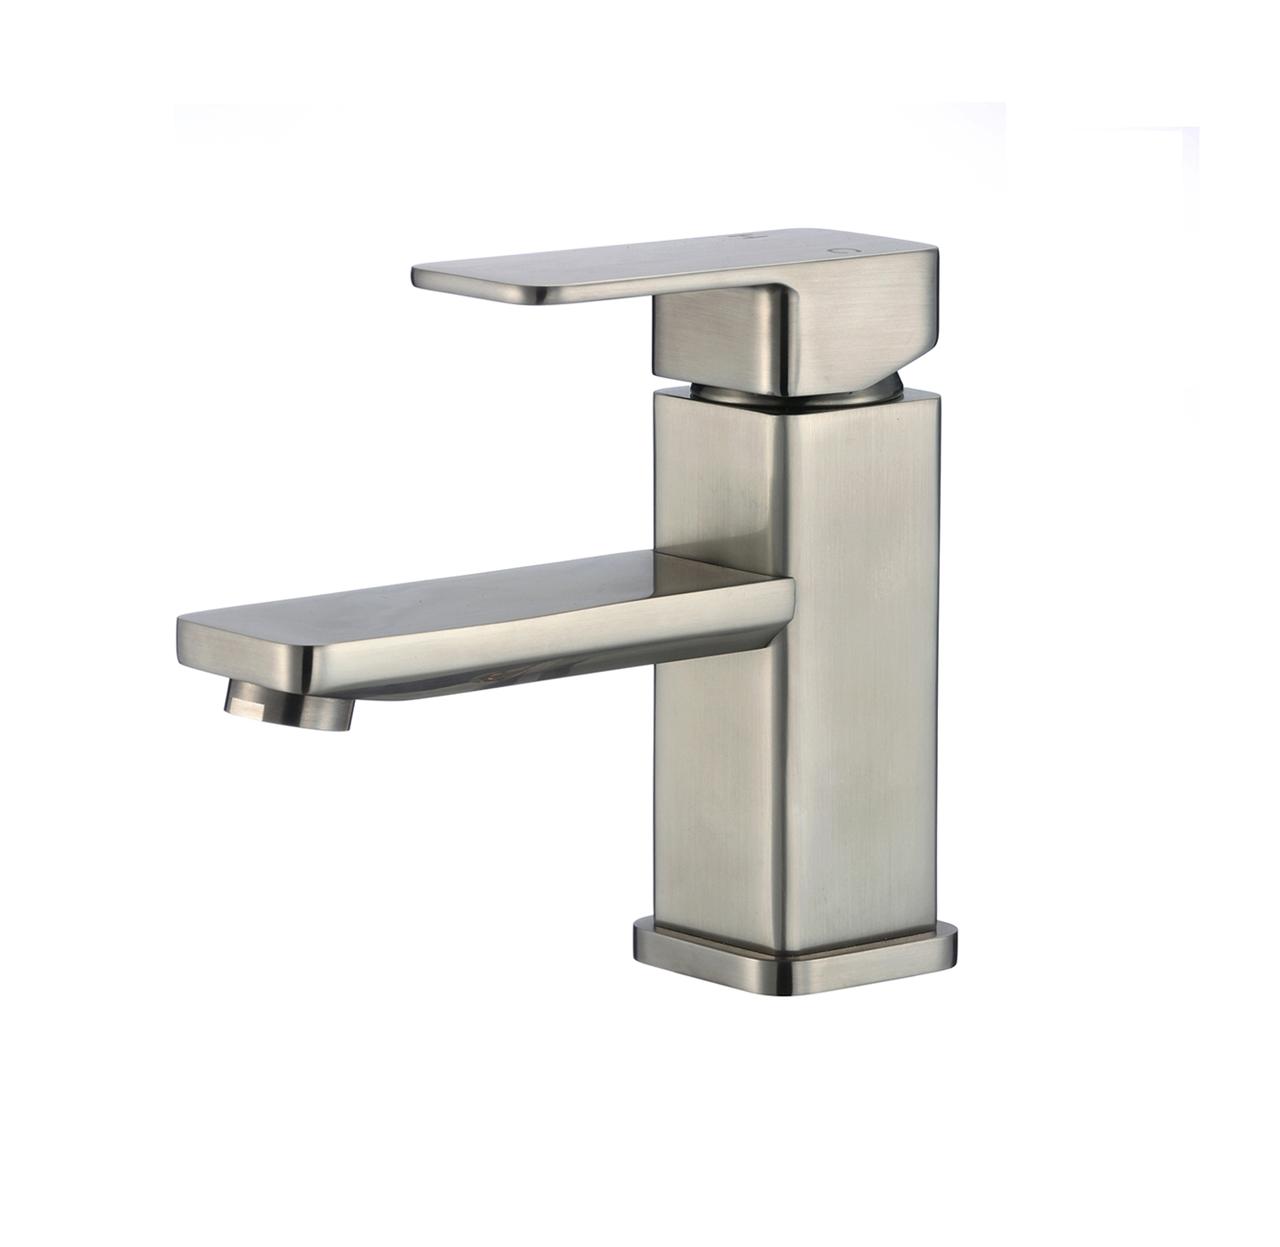 Shop Metz Single Handle Deck Mounted Bathroom Sink Faucet At Bathselect